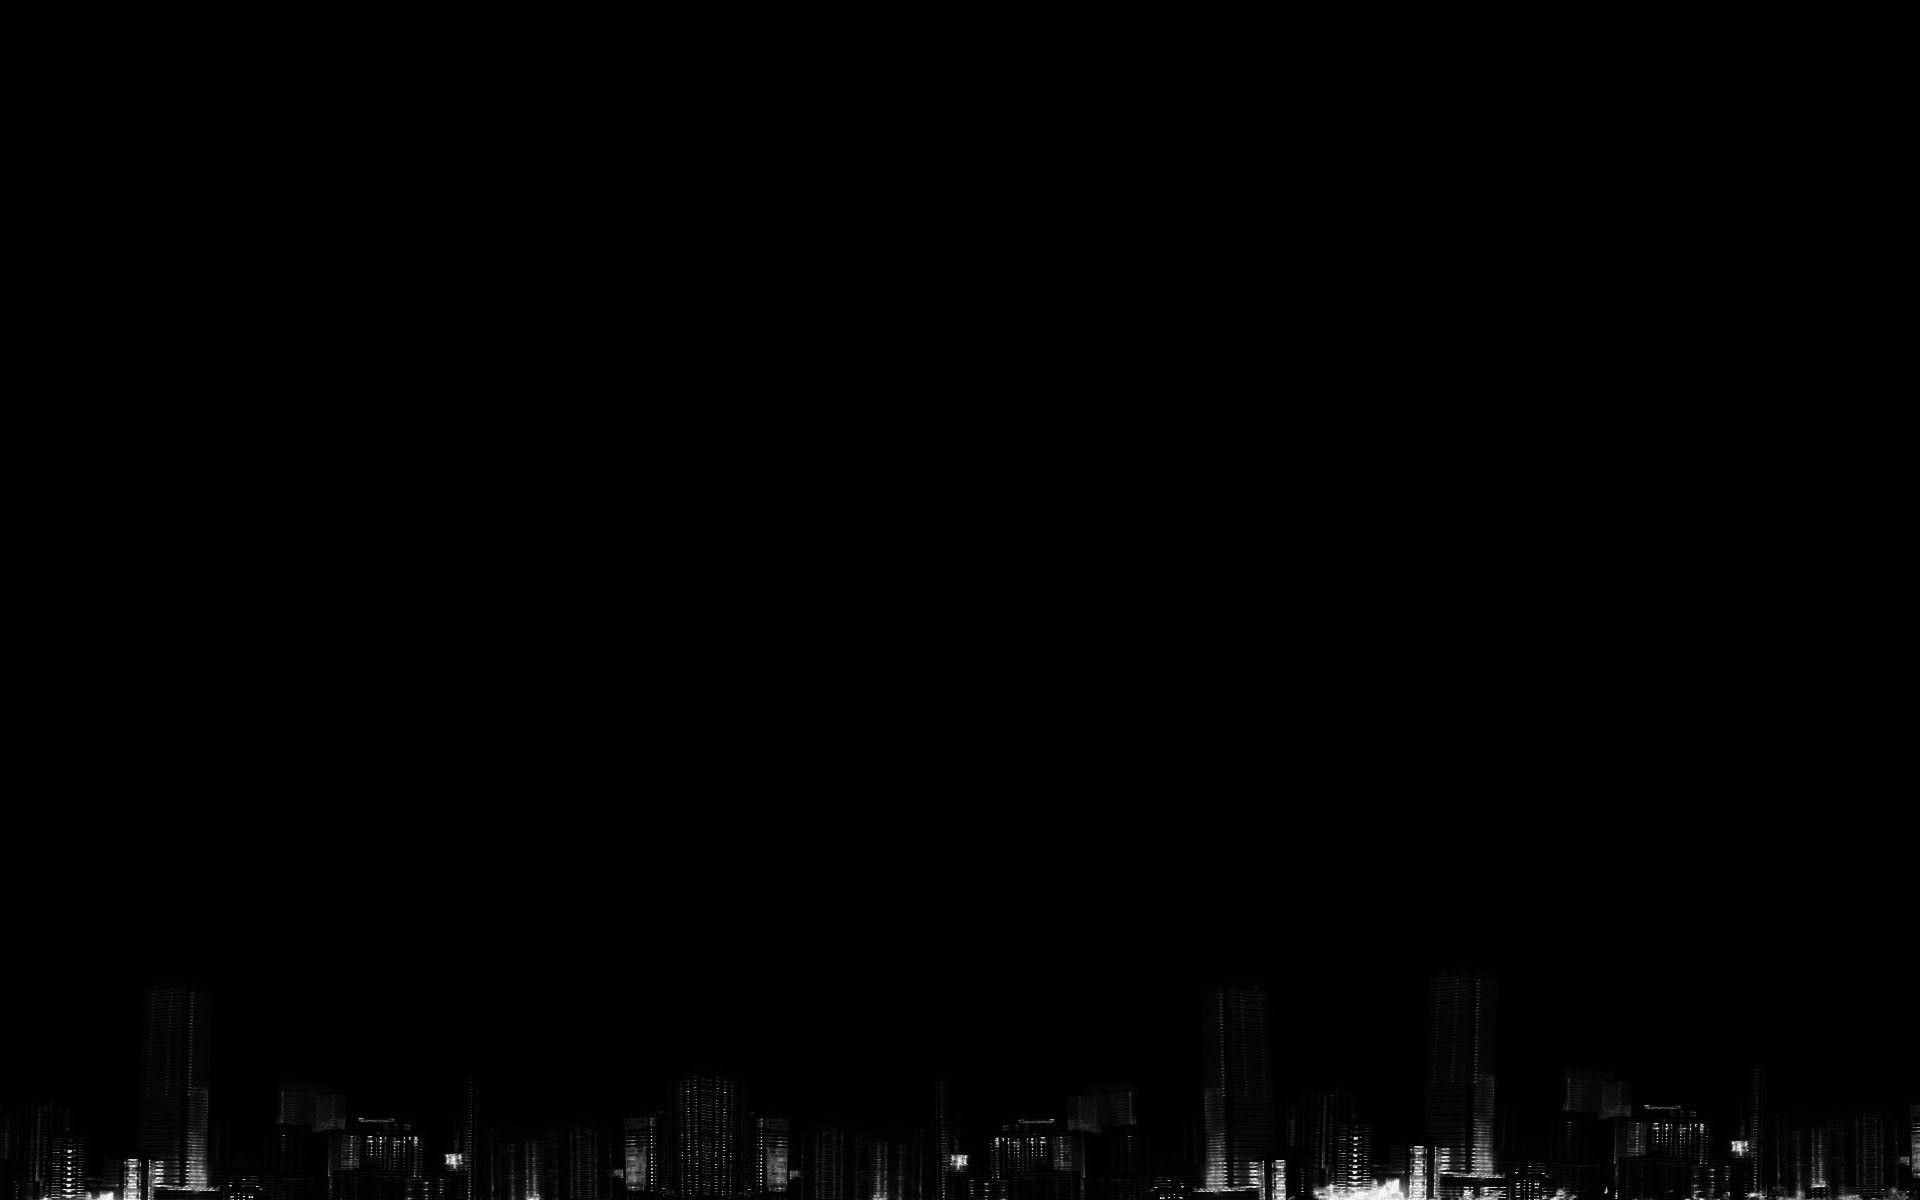 desktop black abstract wallpapers hd download